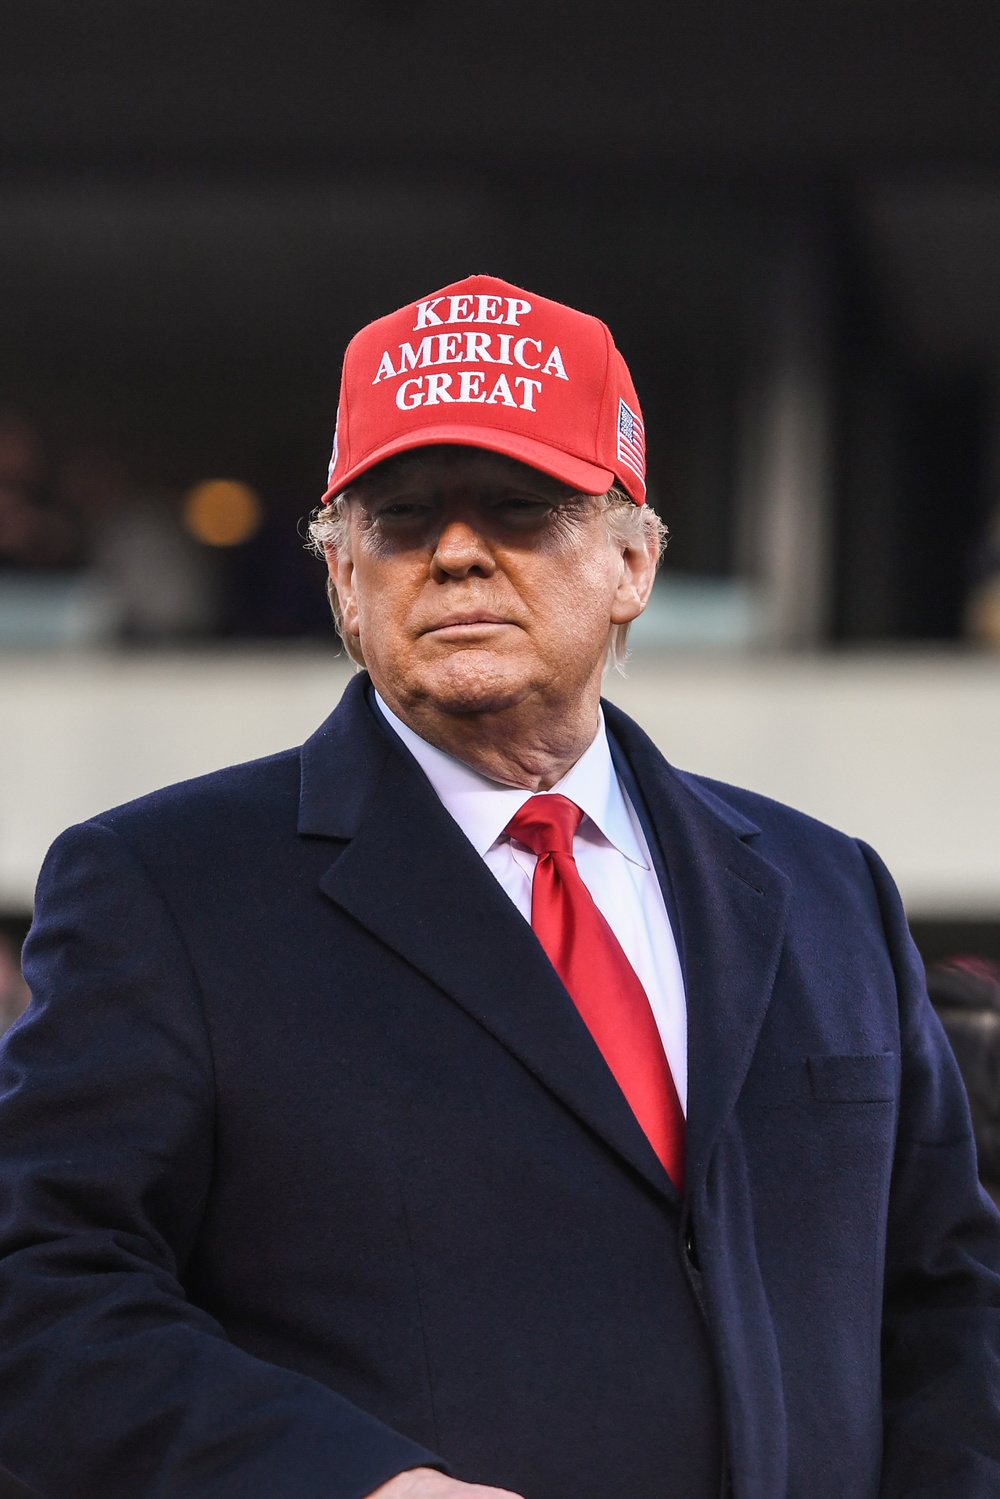 Keep America Great